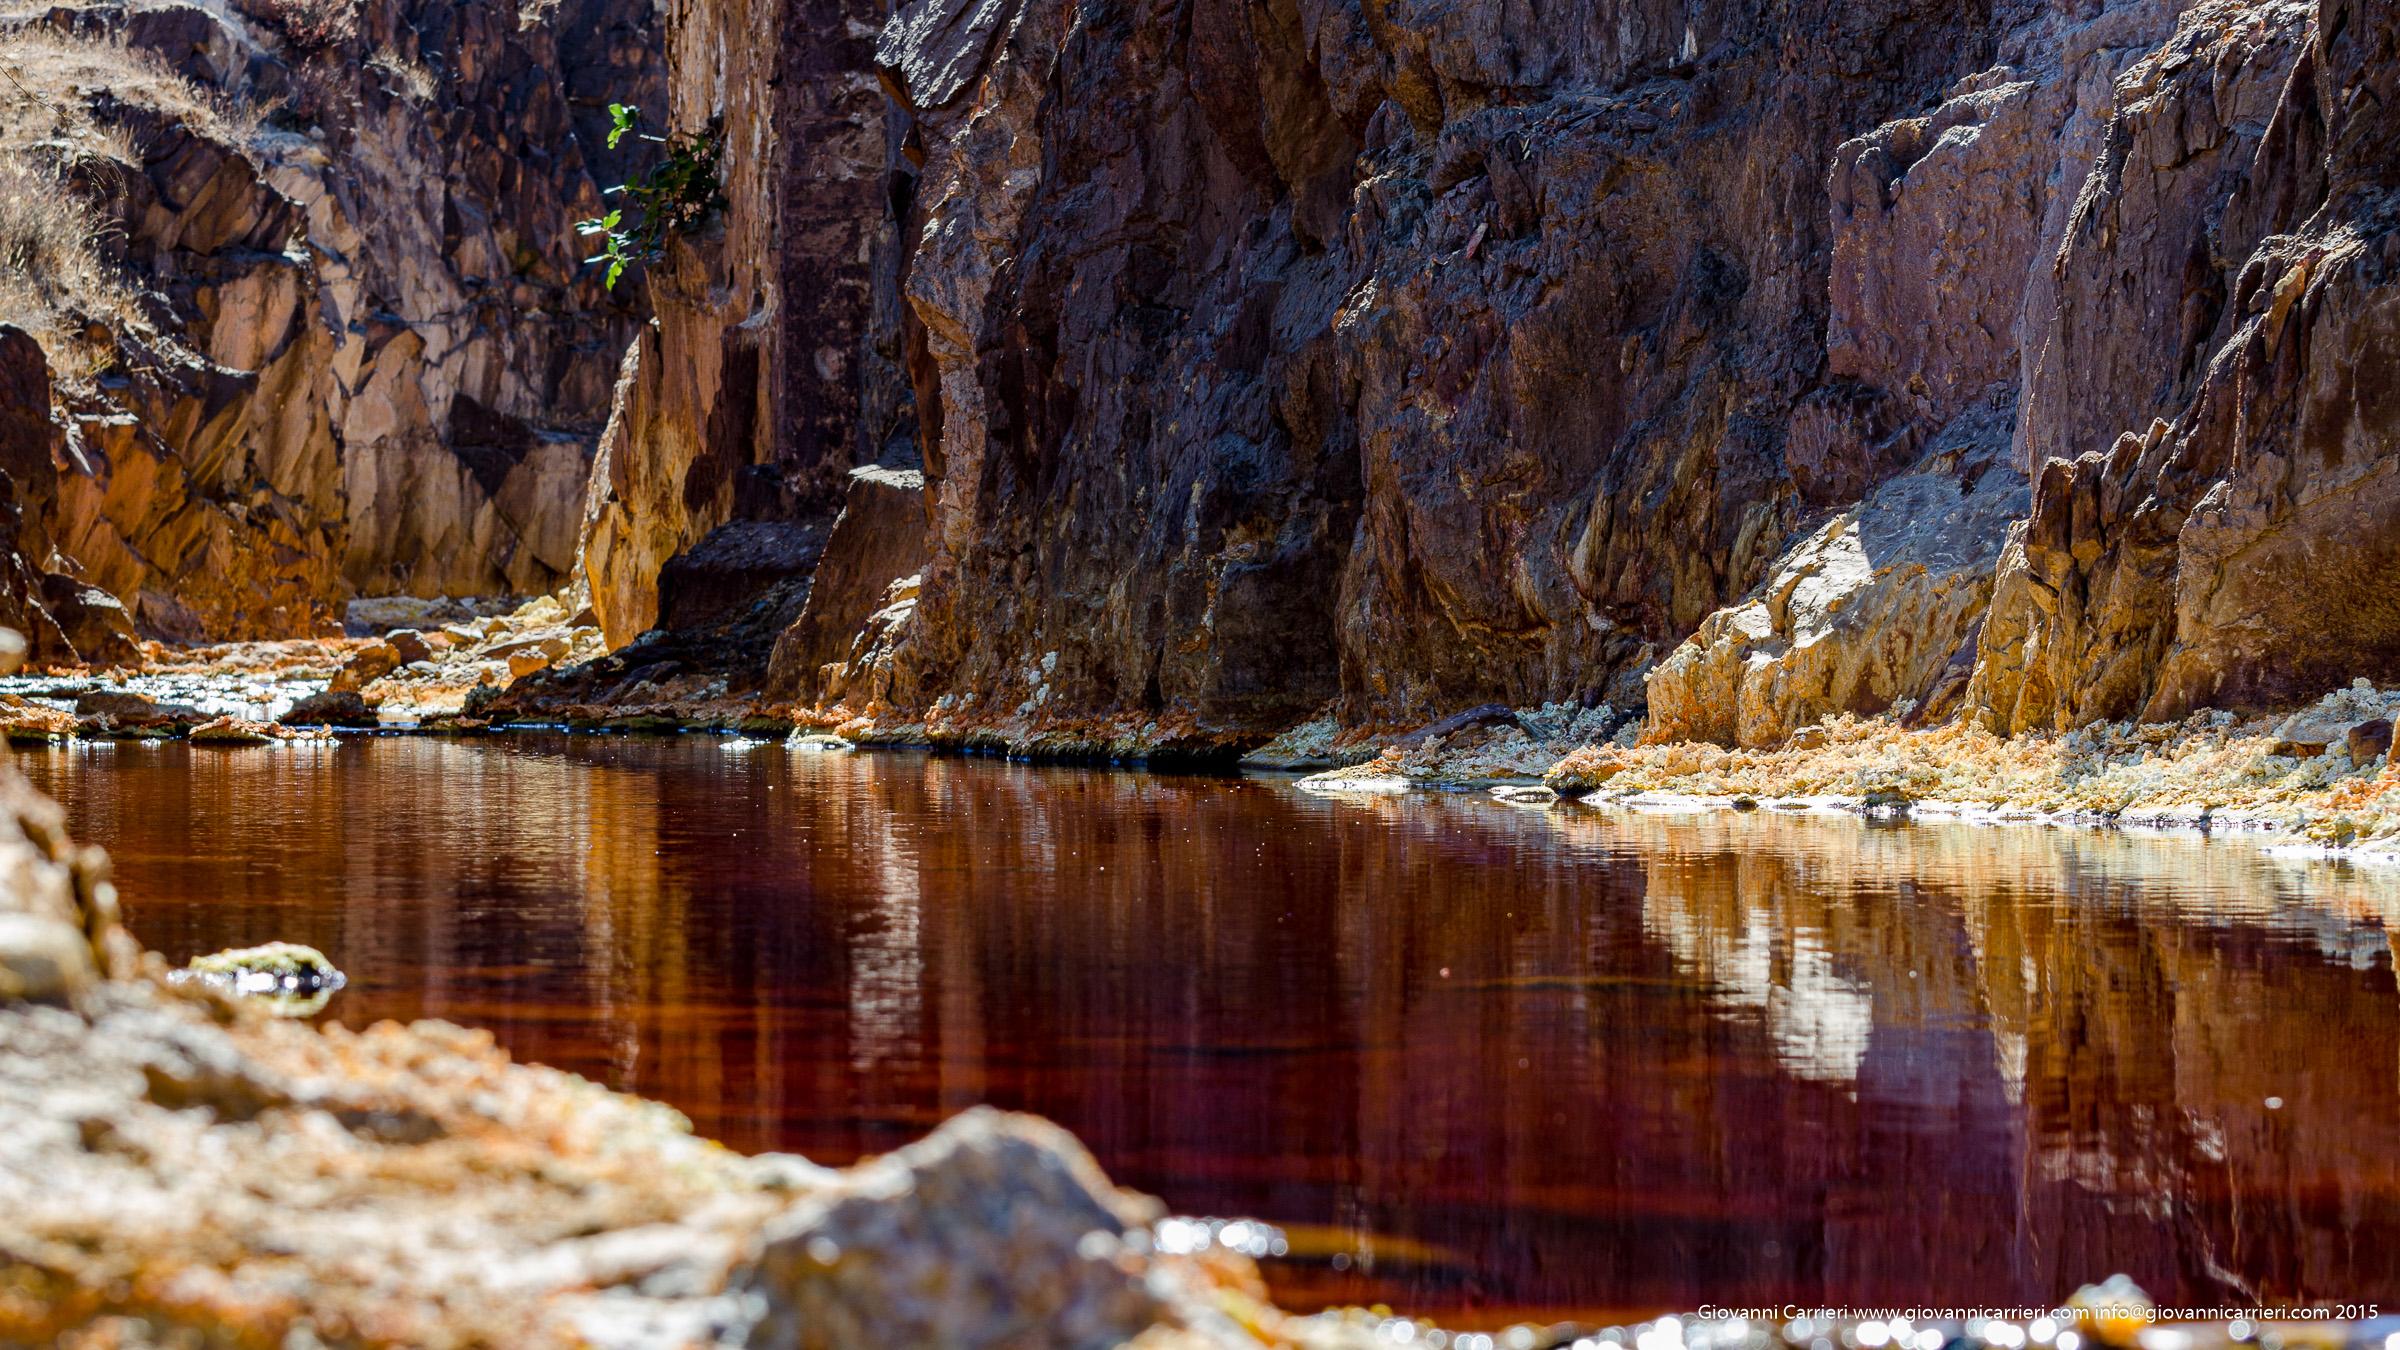 Pietre ed acqua rossa